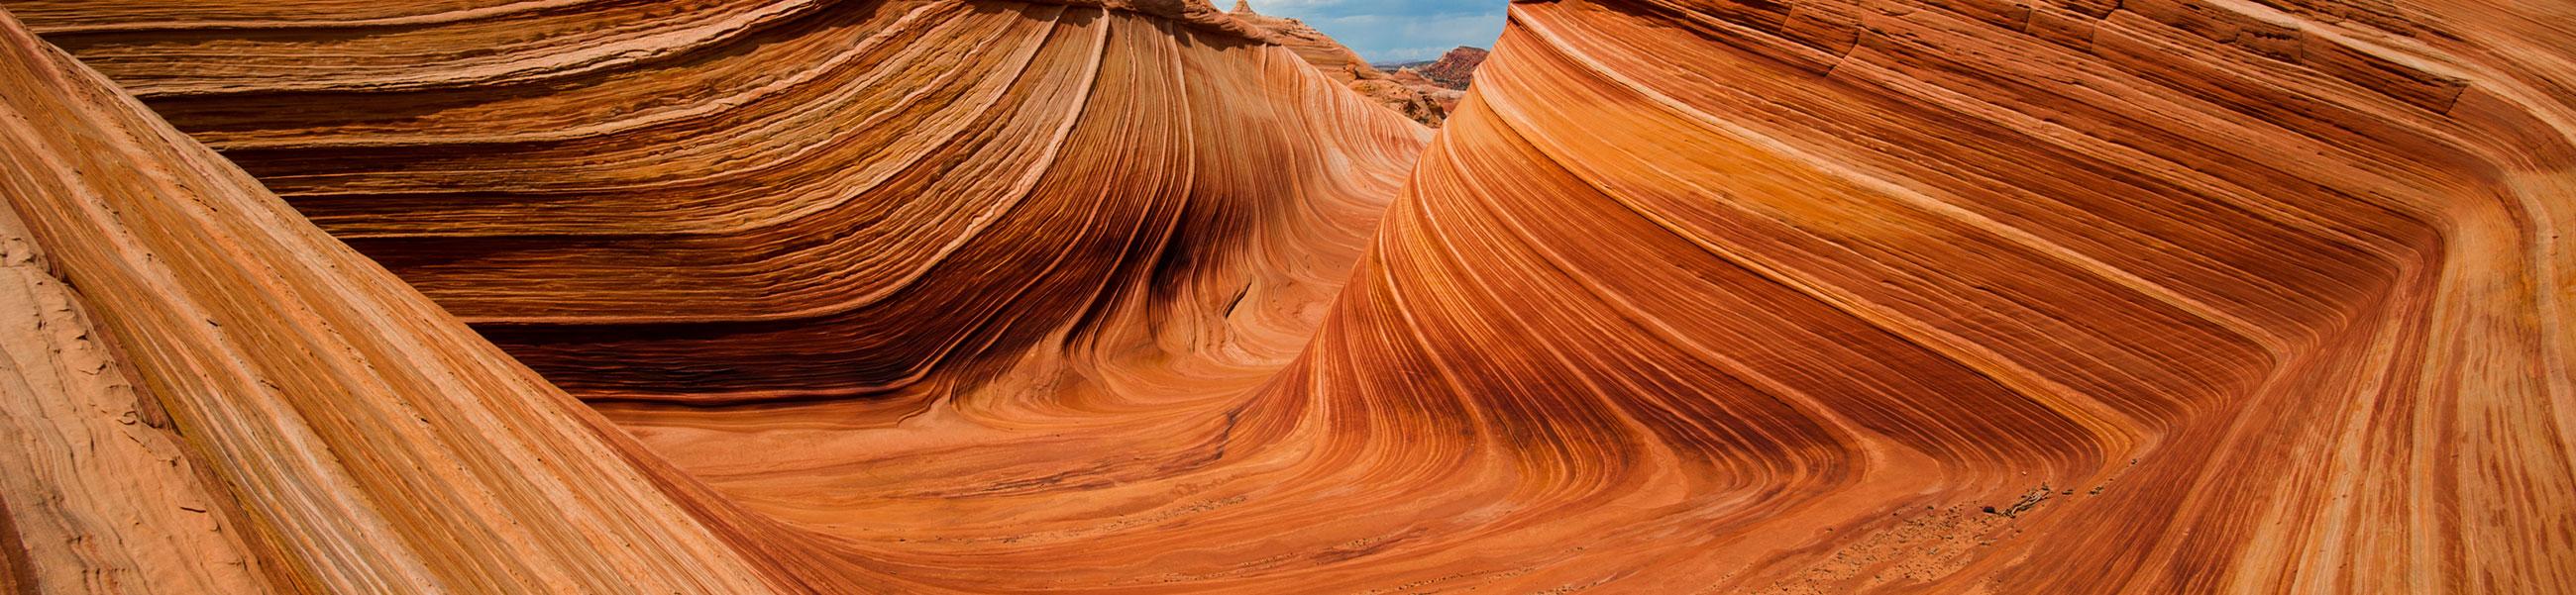 The Wave, North Coyote Buttes, Arizona